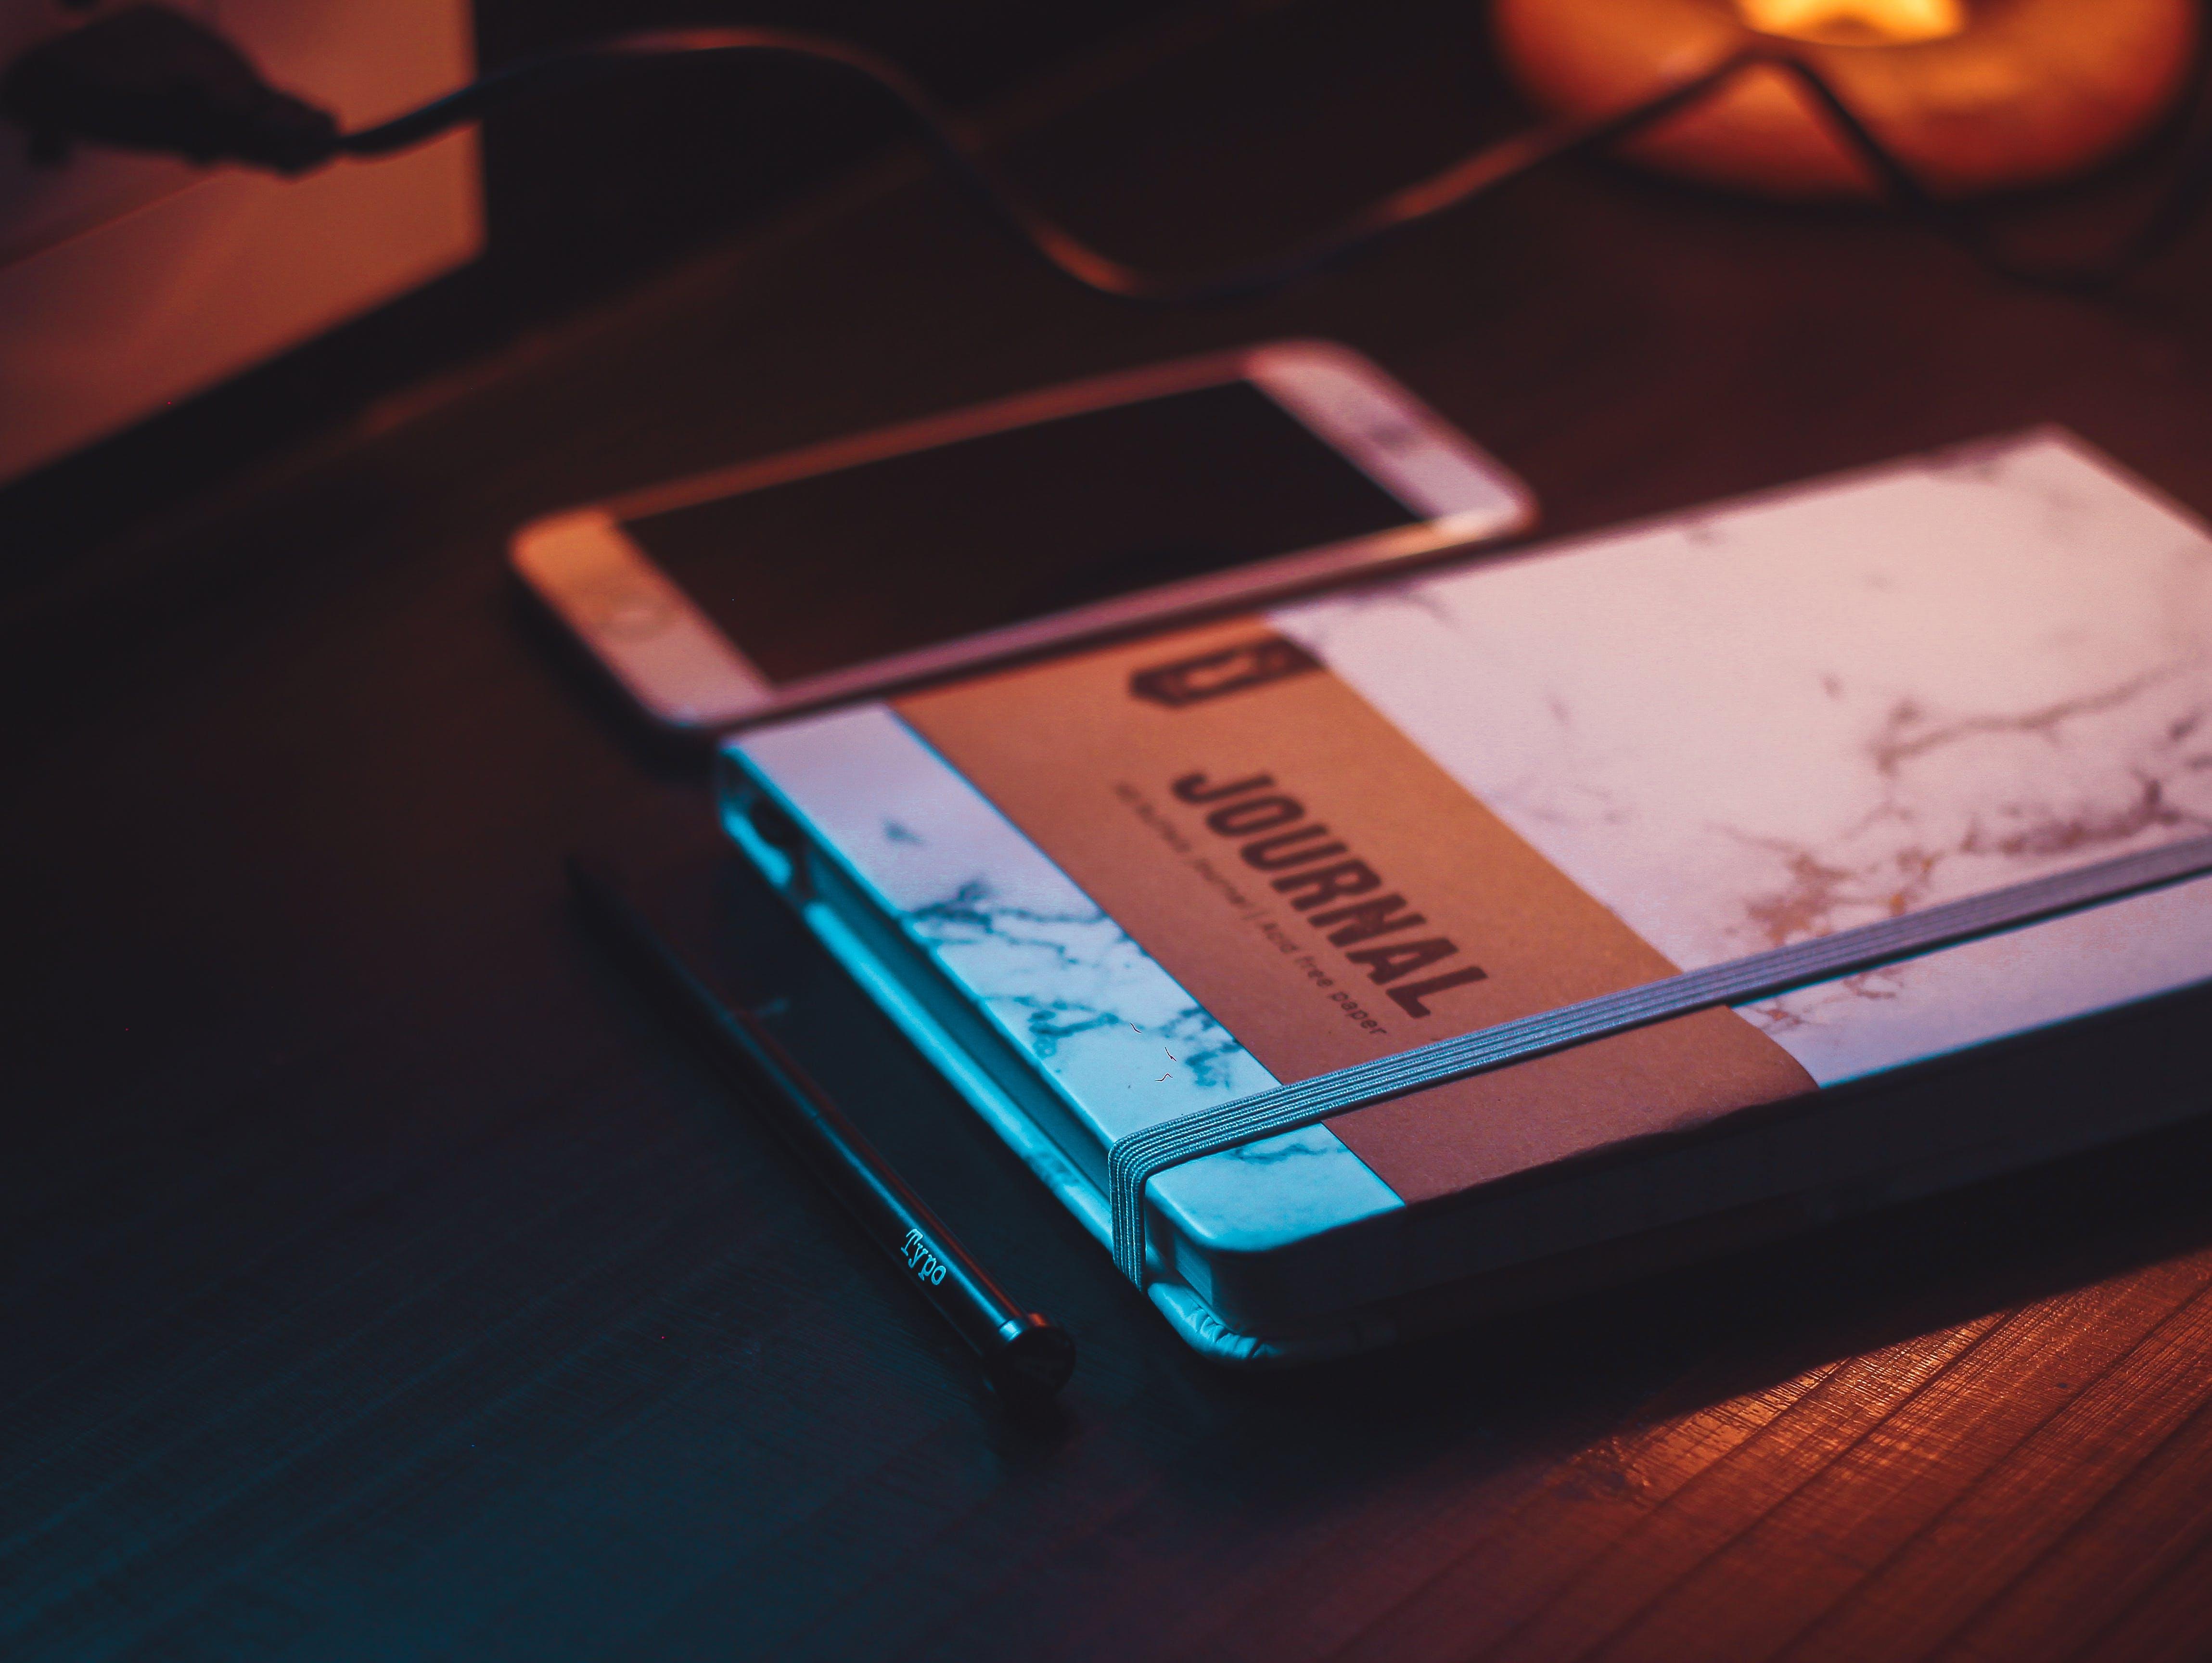 close-up, desk, electronics